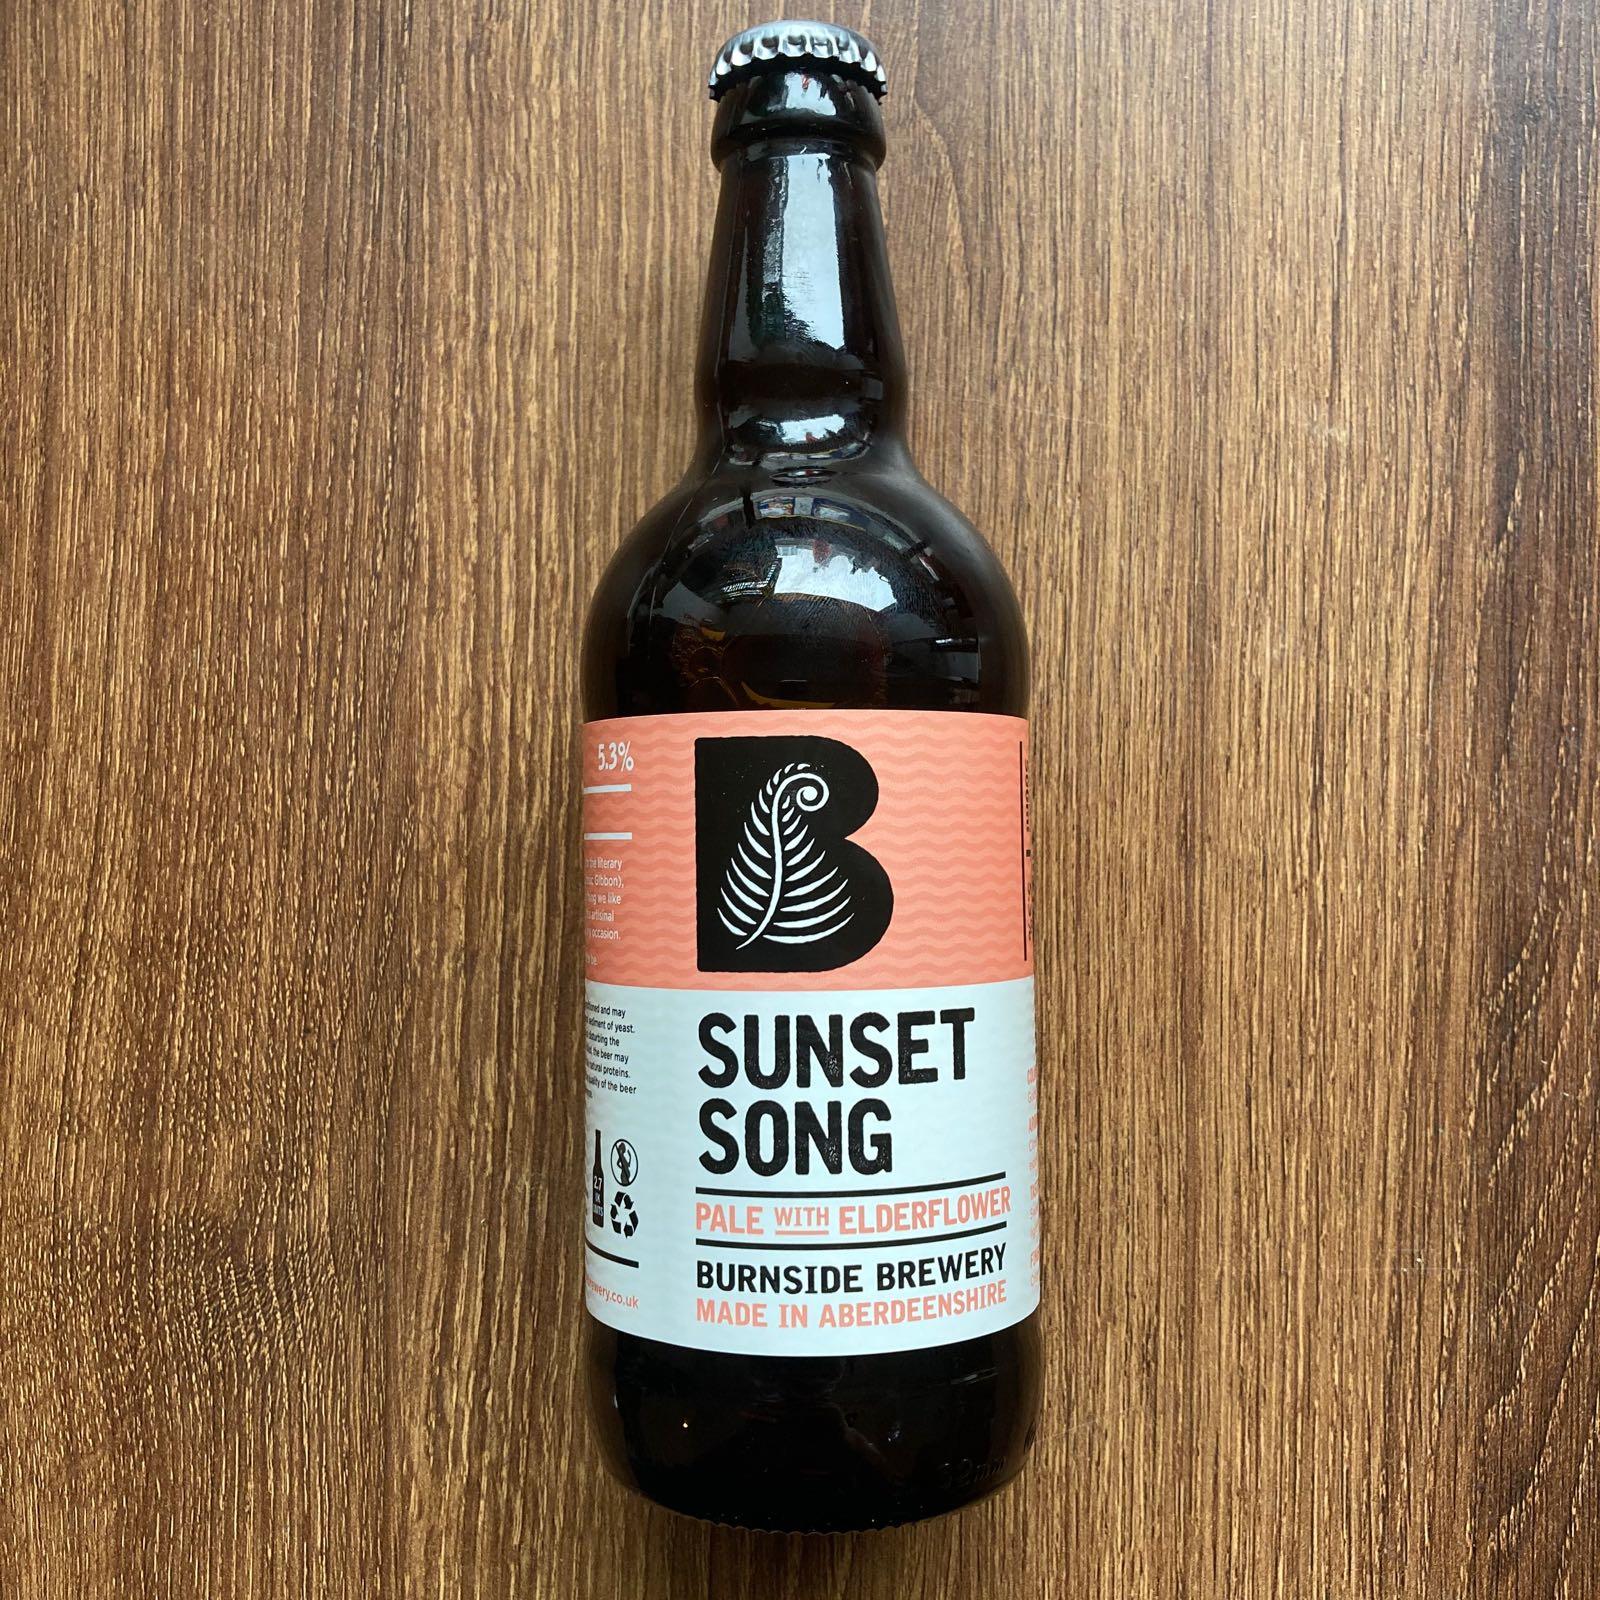 Sunset Song - Burnside Brewery